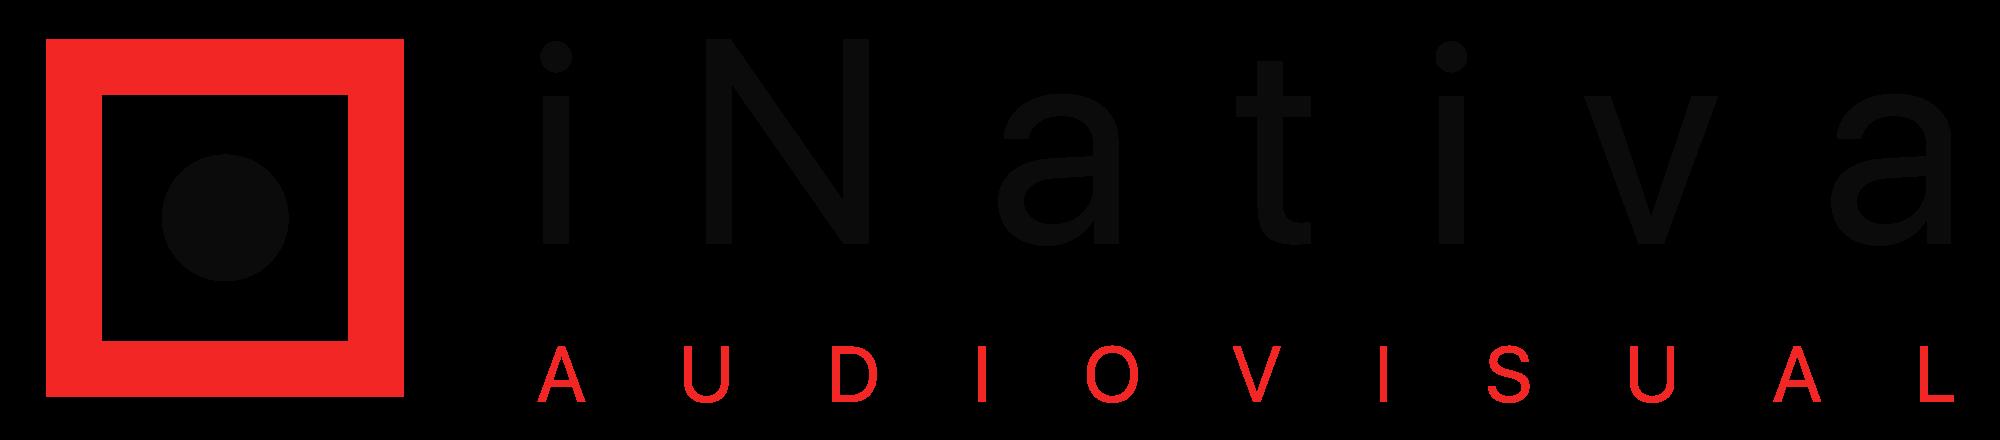 Empresas Desafio10x: iNativa Audiovisual